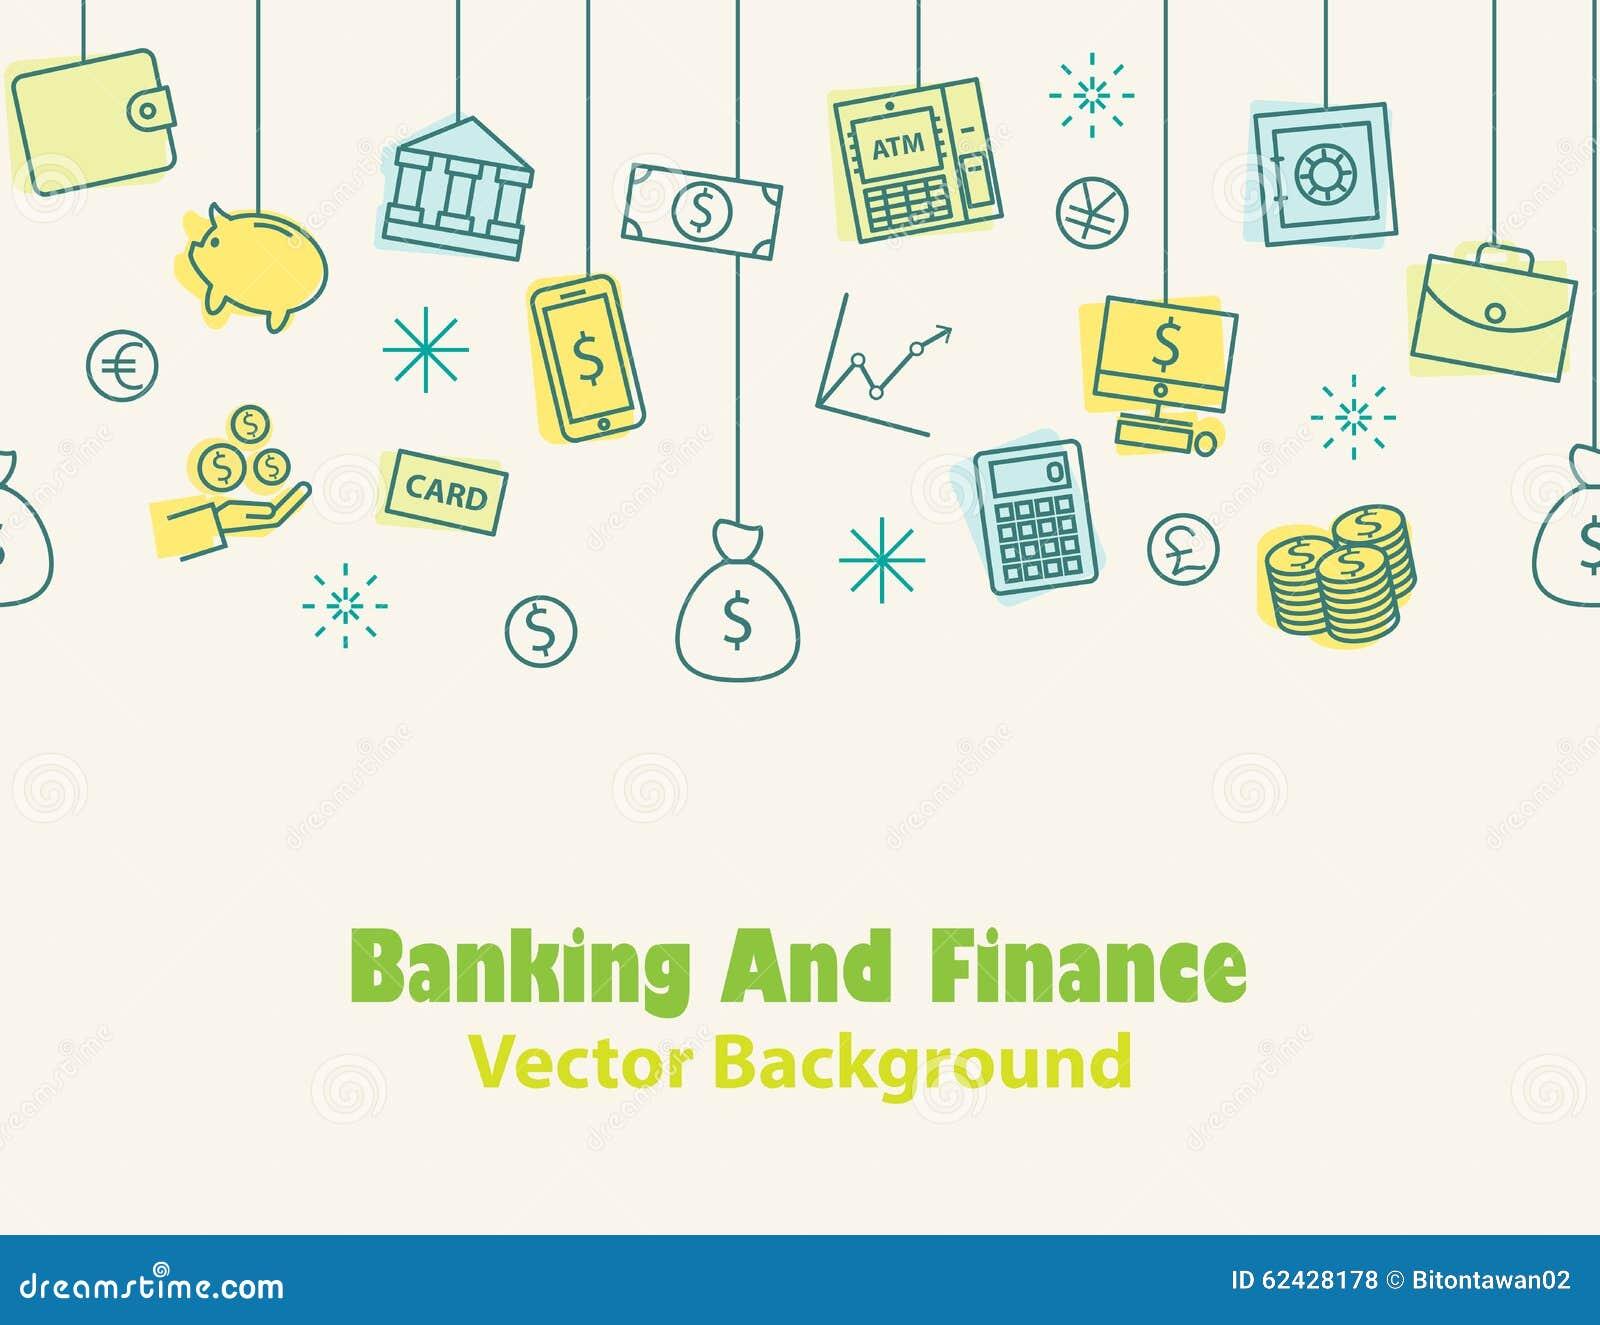 Finance Background: Franc Cartoons, Illustrations & Vector Stock Images